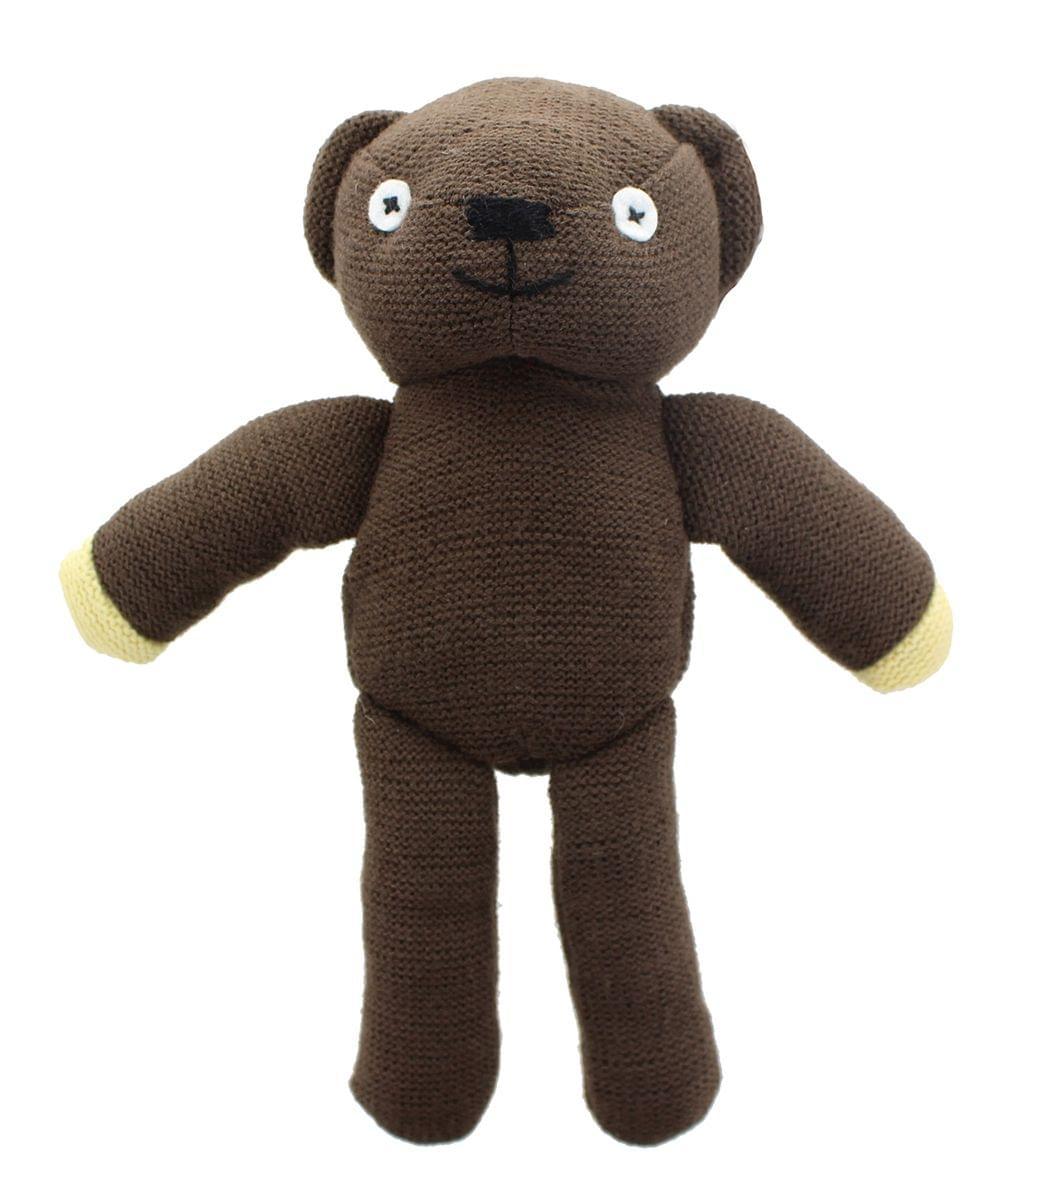 mr bean 10 plush teddy bear 91671962308 ebay